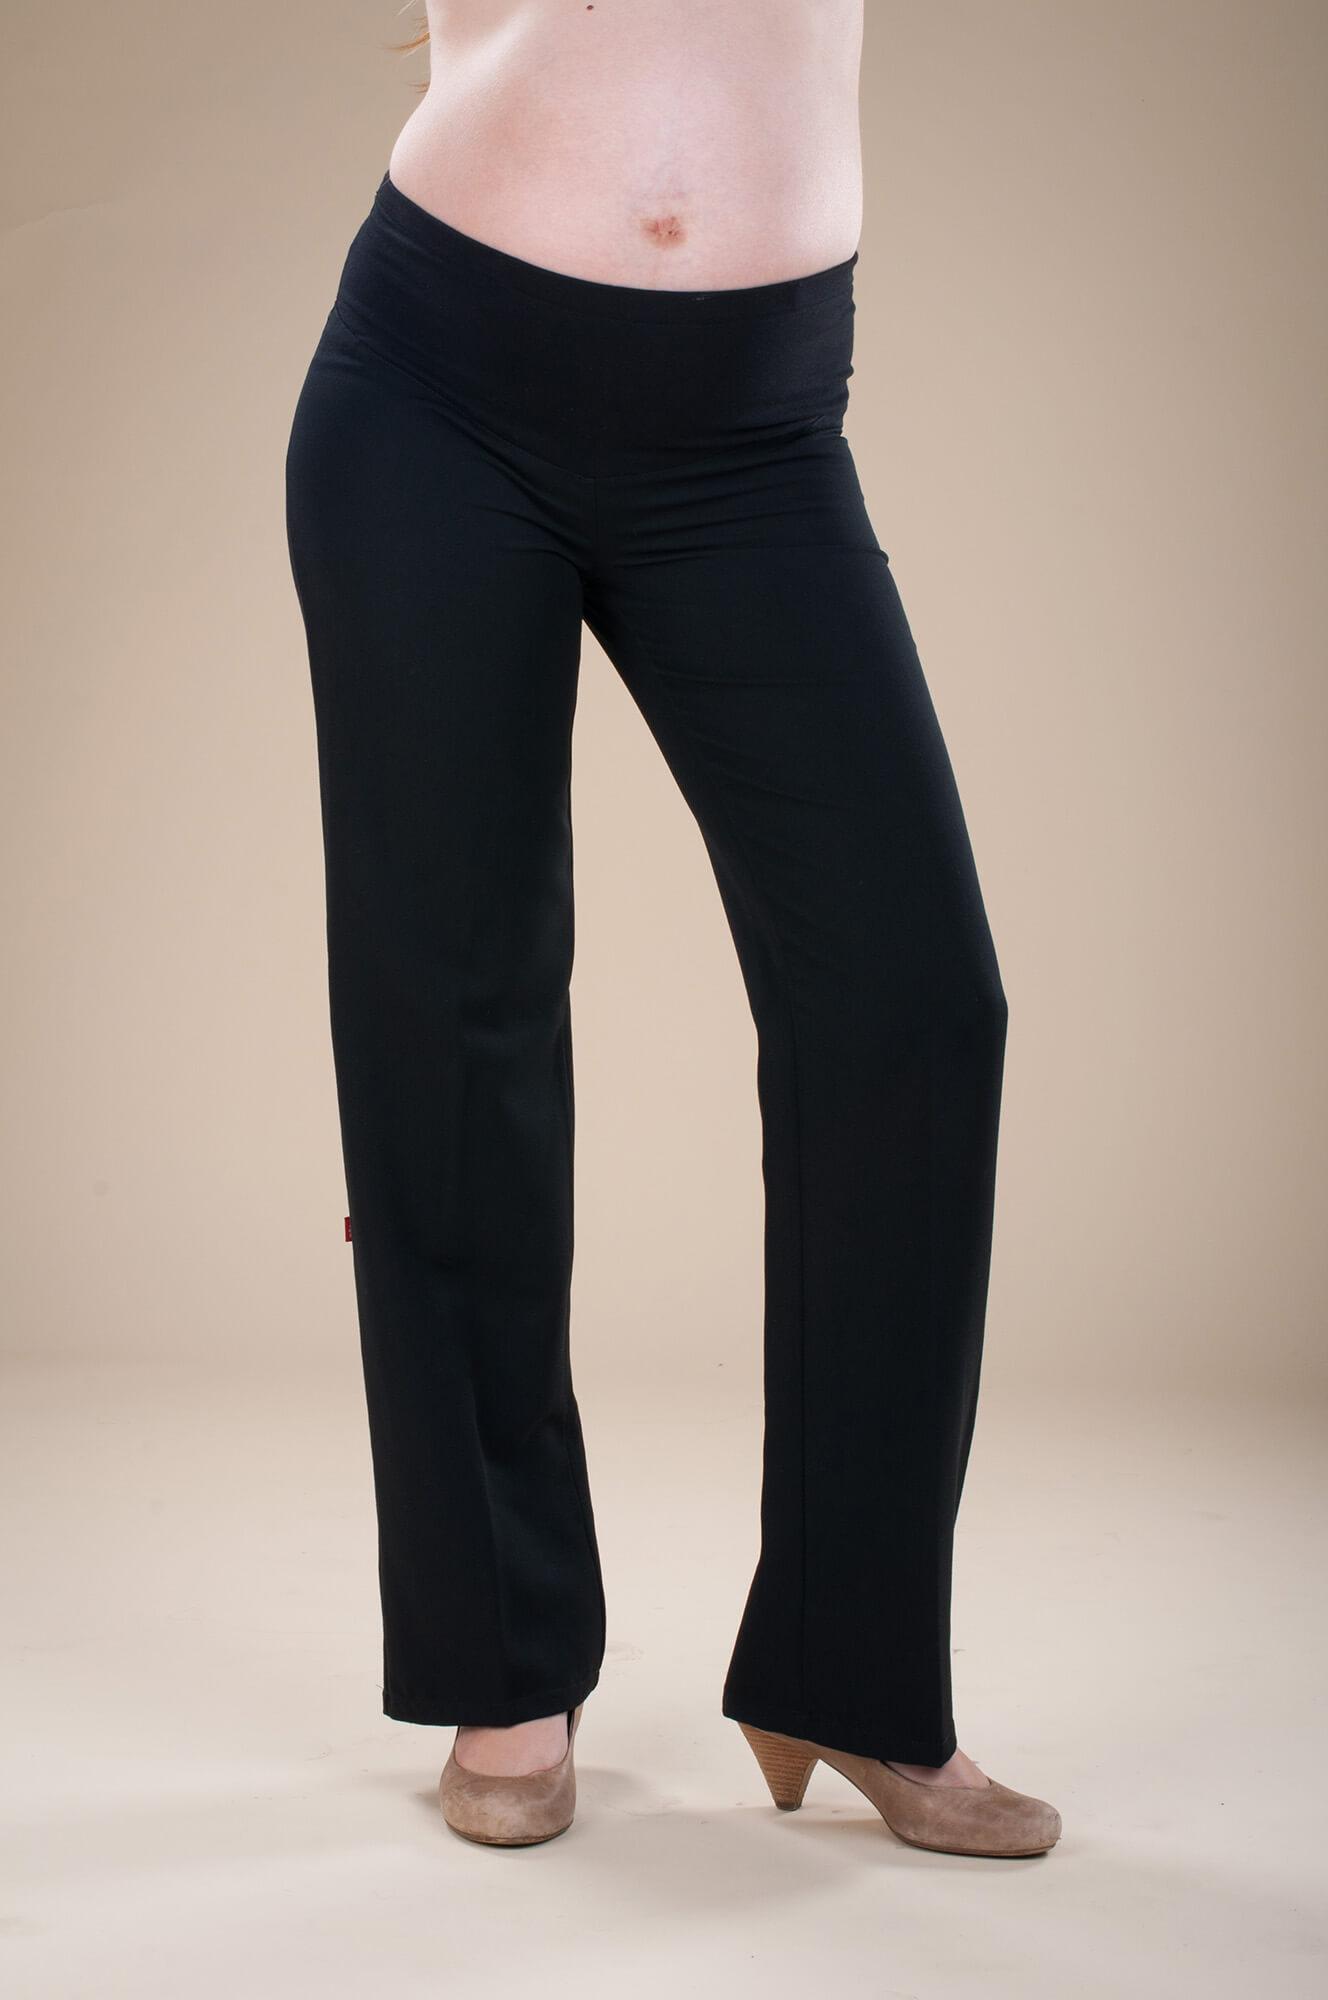 Maternity Pants – Elegant Cut